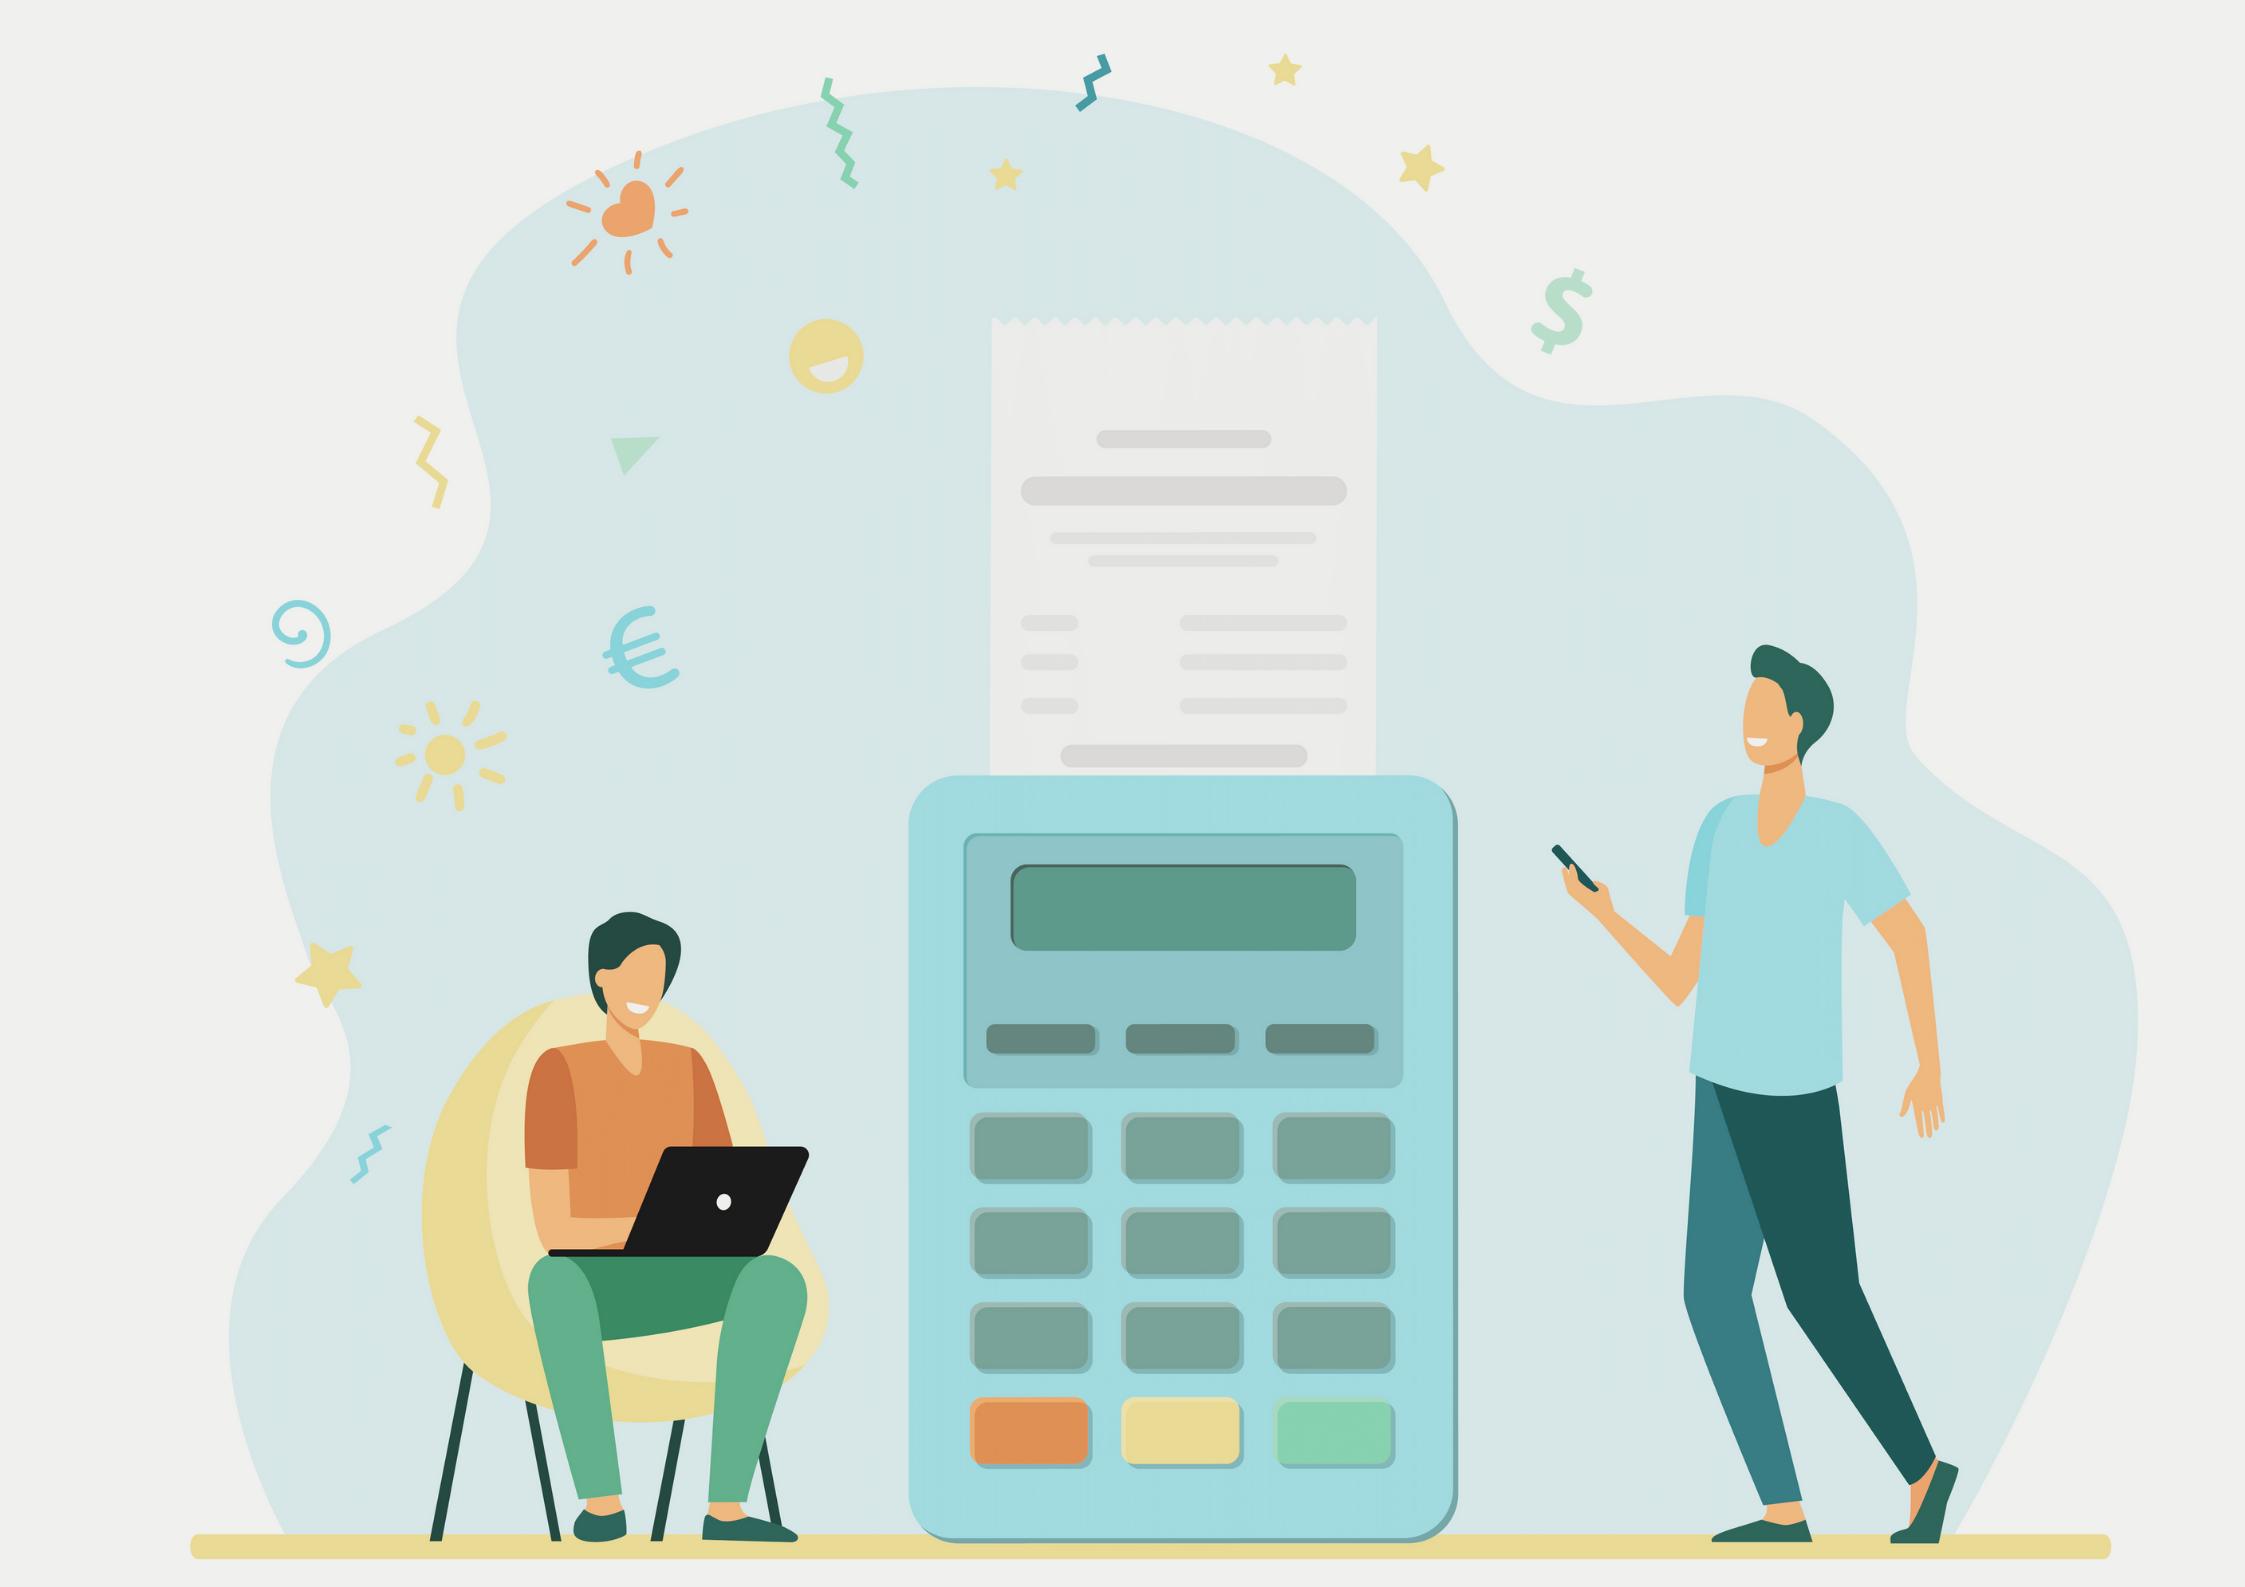 Woocommerce invoice system 1